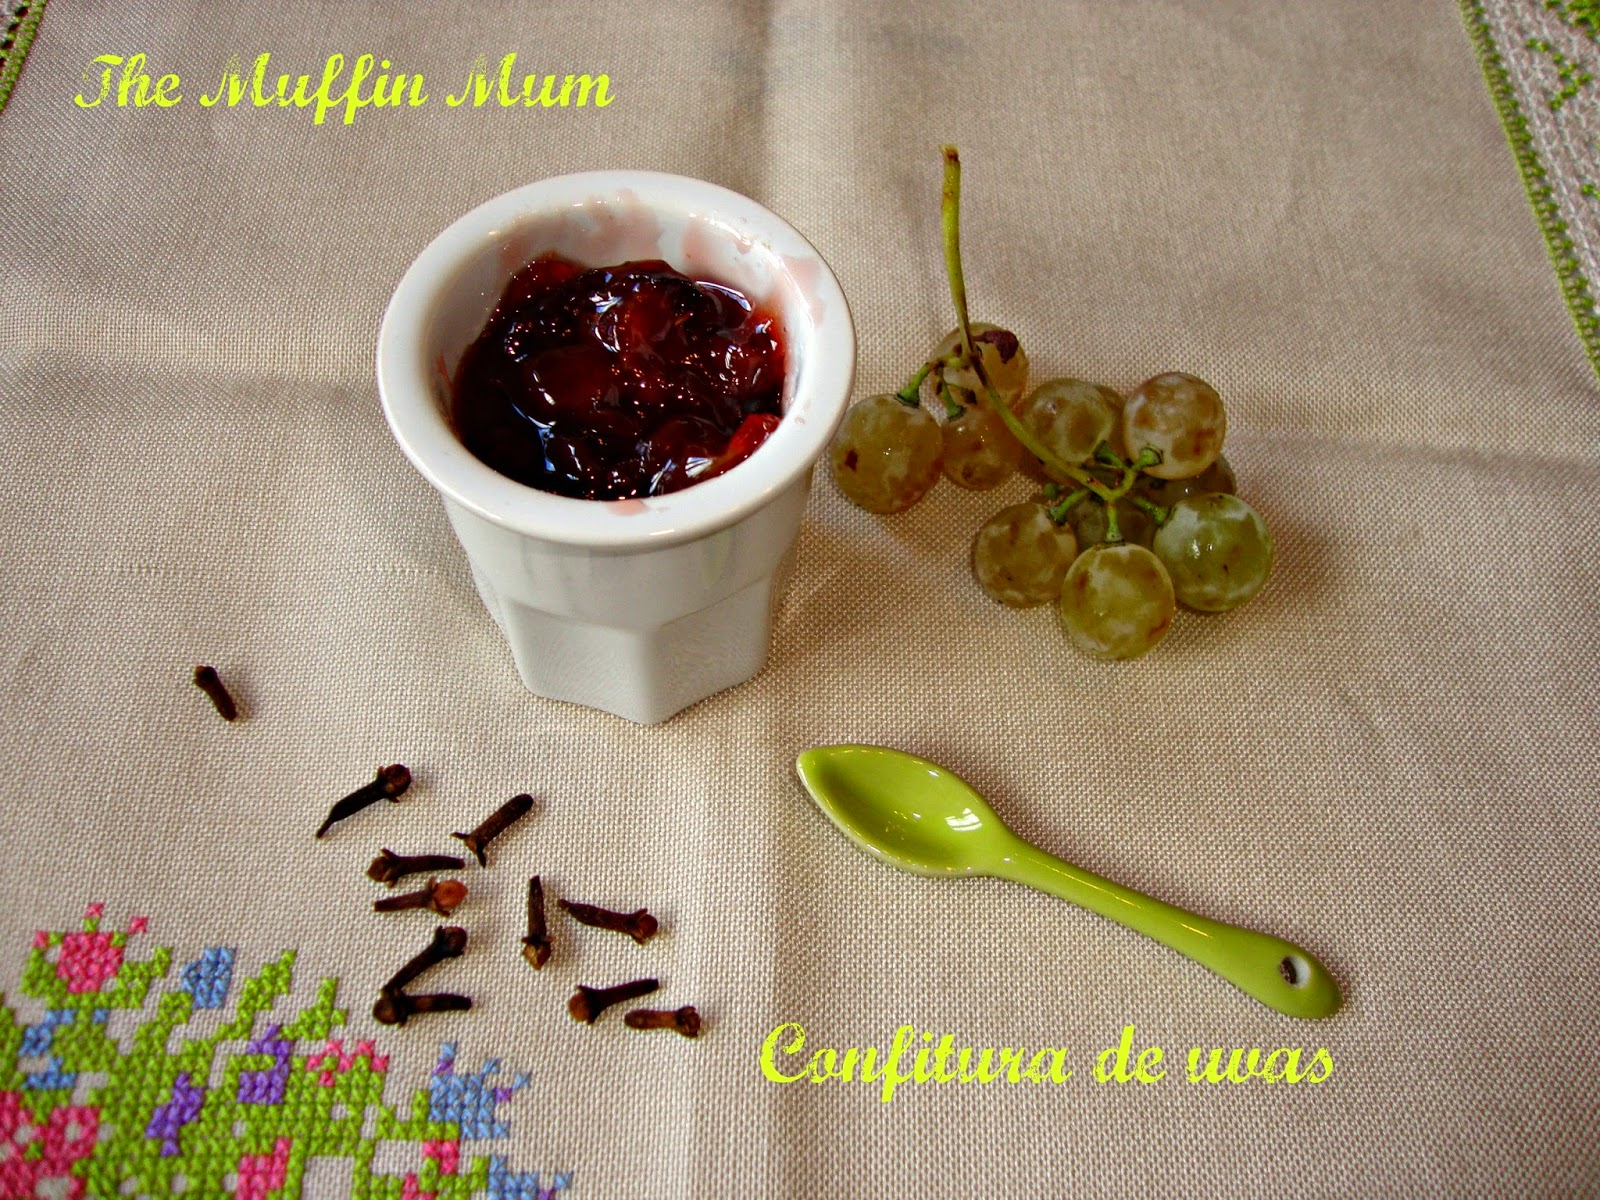 Confitura de uvas especiada